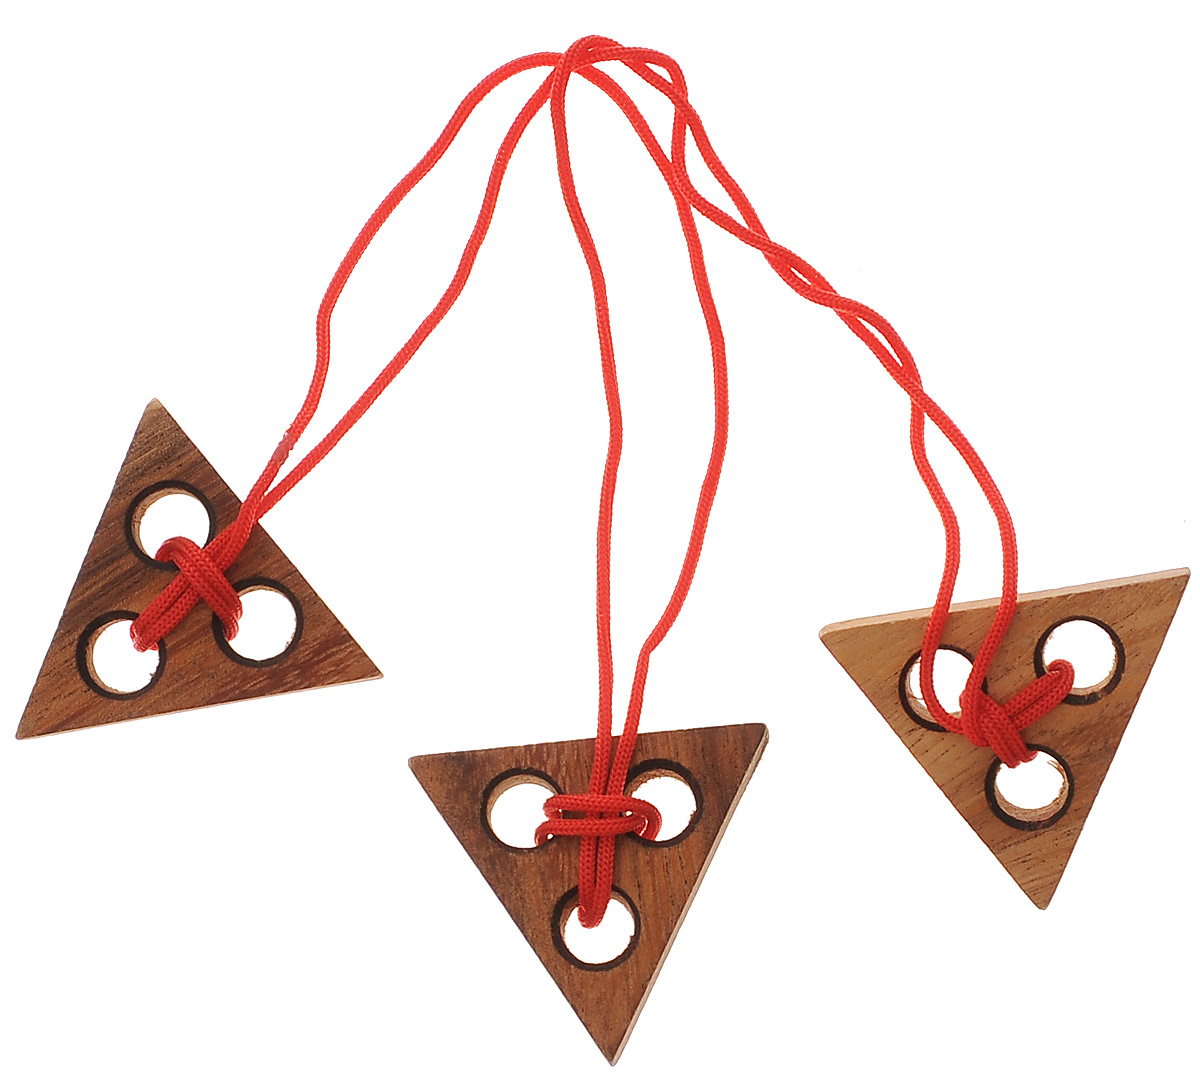 Dilemma Головоломка Три треугольника